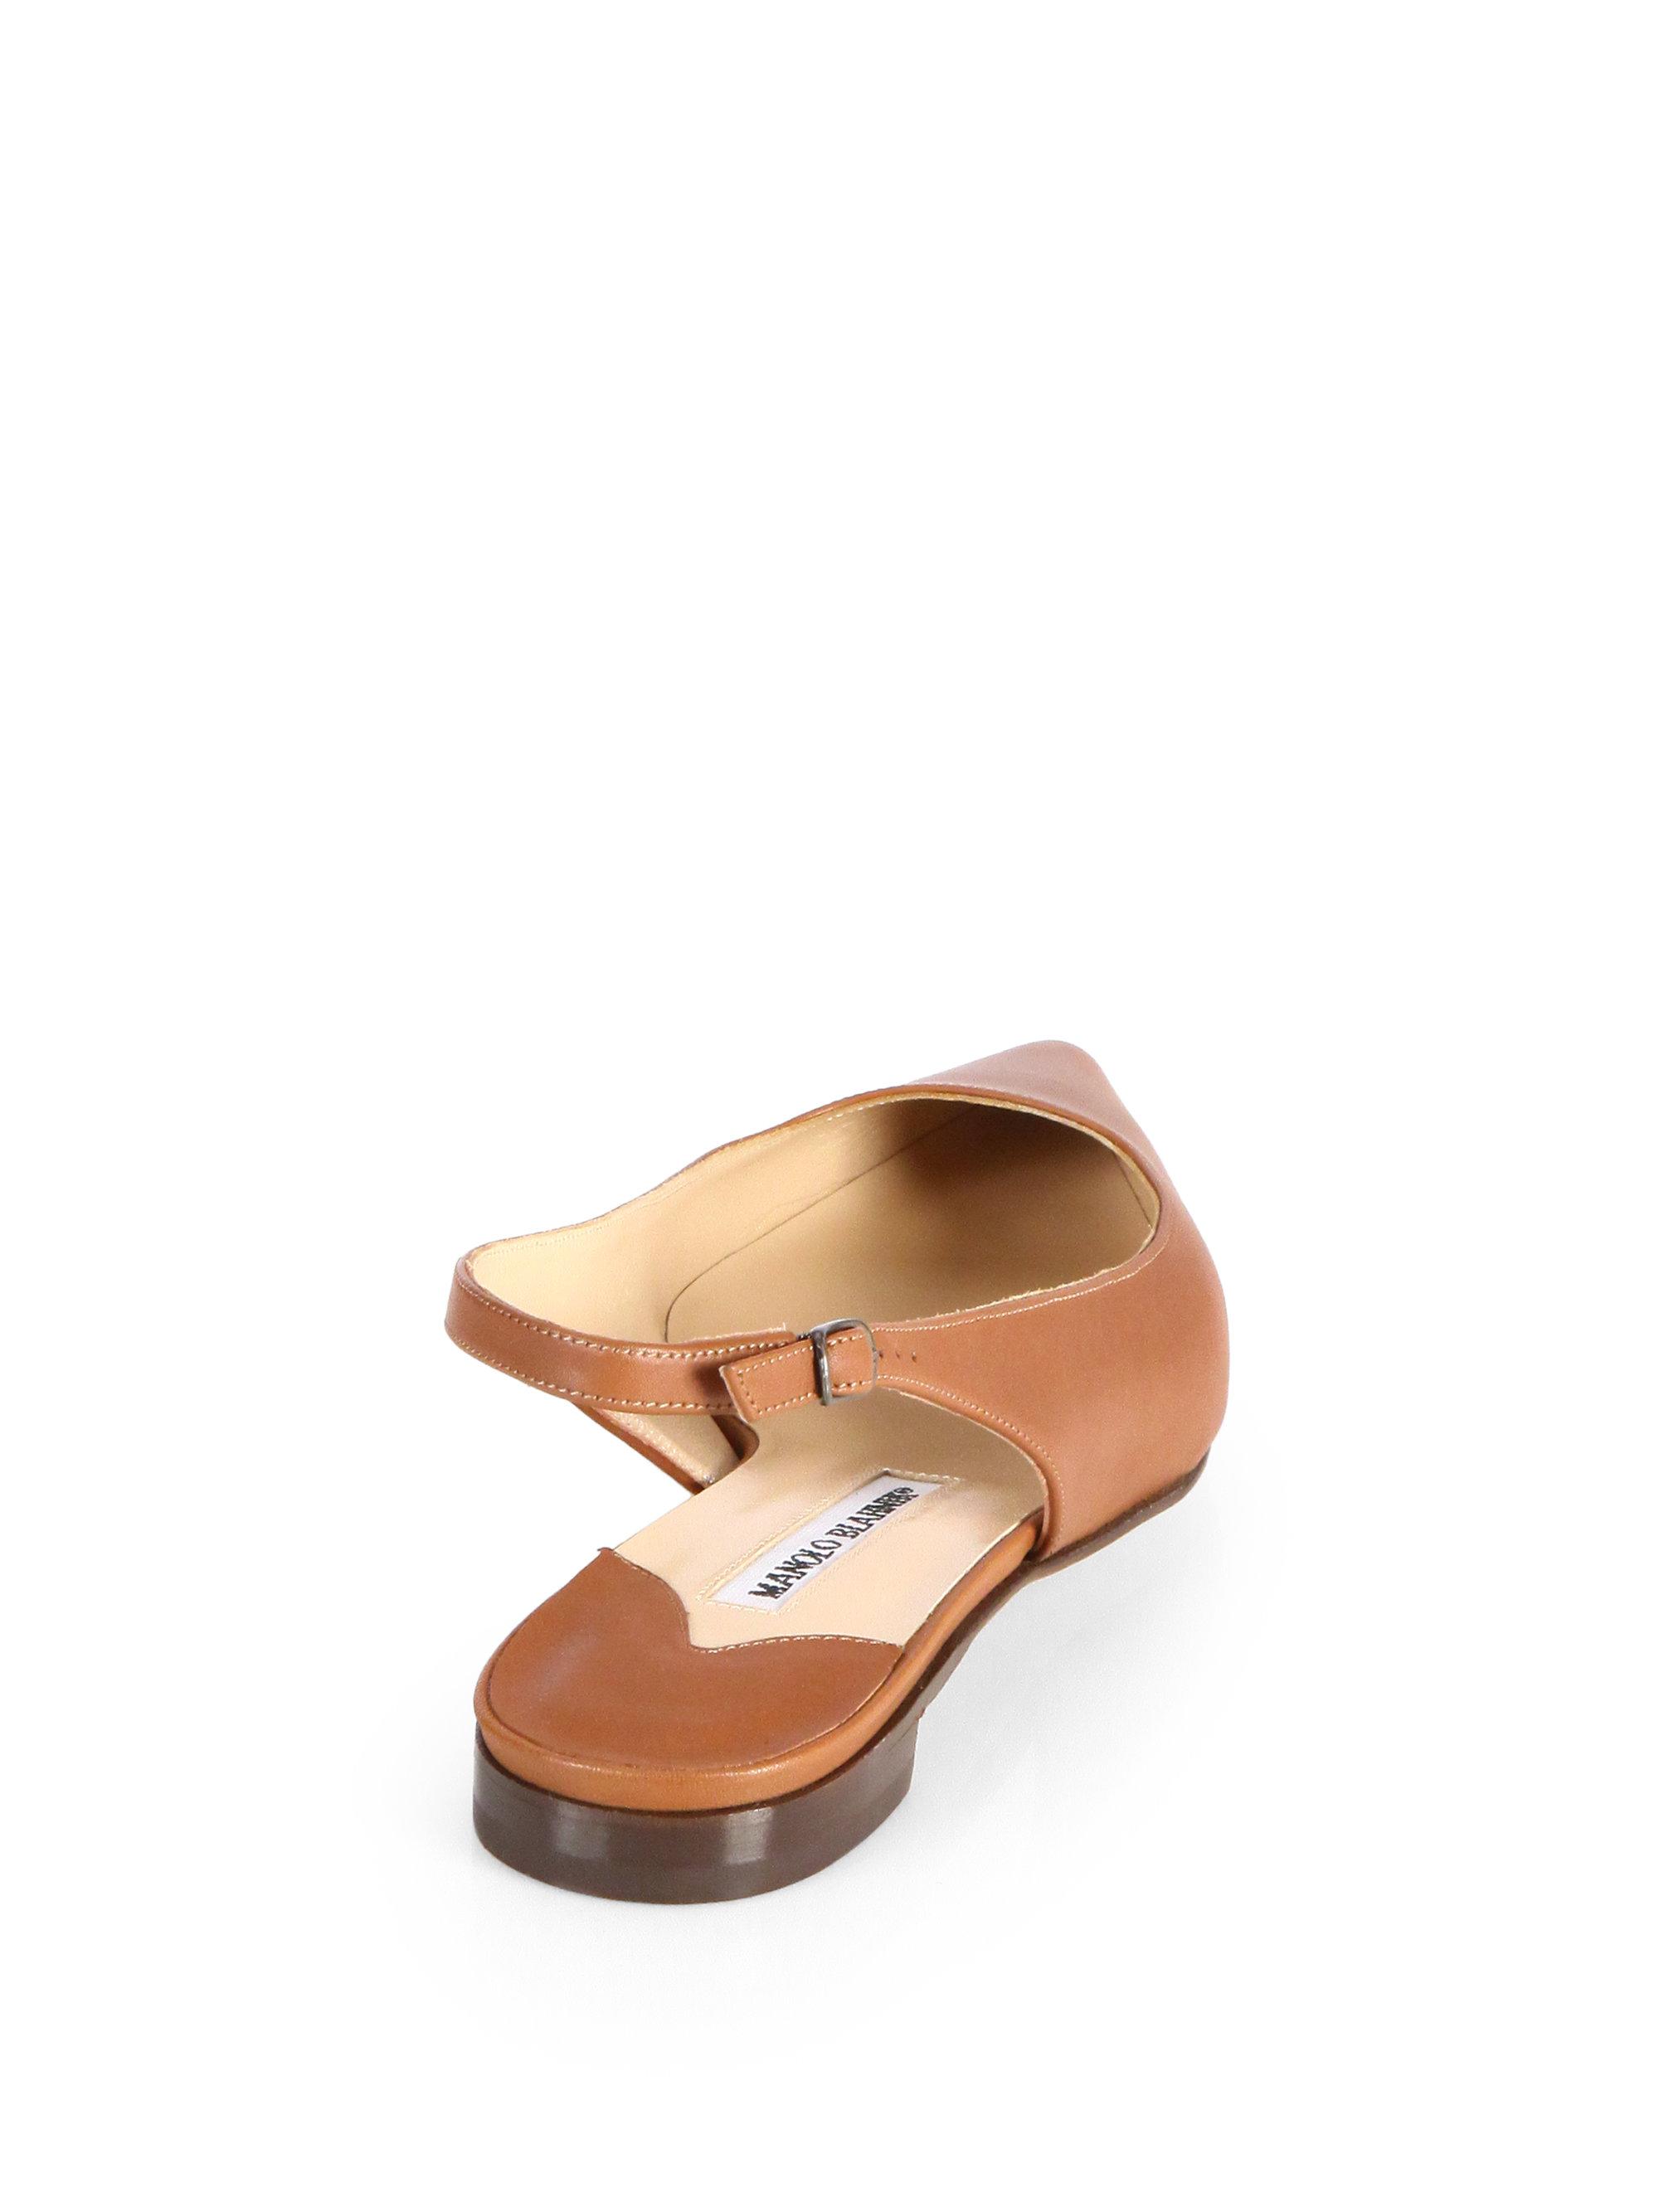 where can i buy manolo blahnik shoes in las vegas